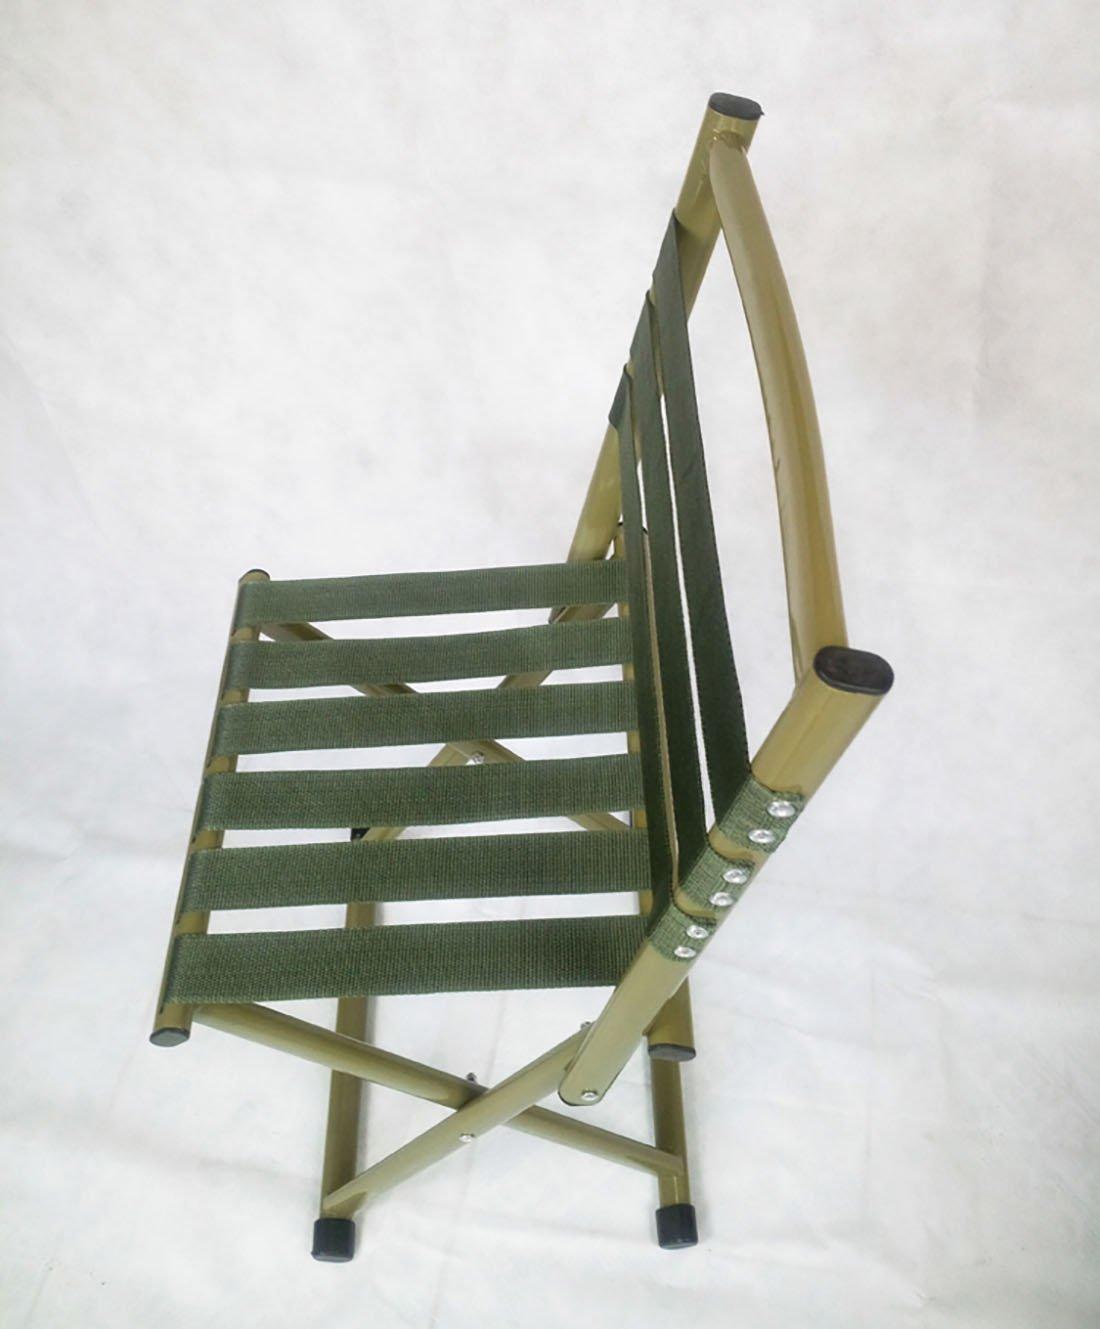 Phenomenal Buy Sannix Folding Step Stool Light And Portable Stool Cjindustries Chair Design For Home Cjindustriesco